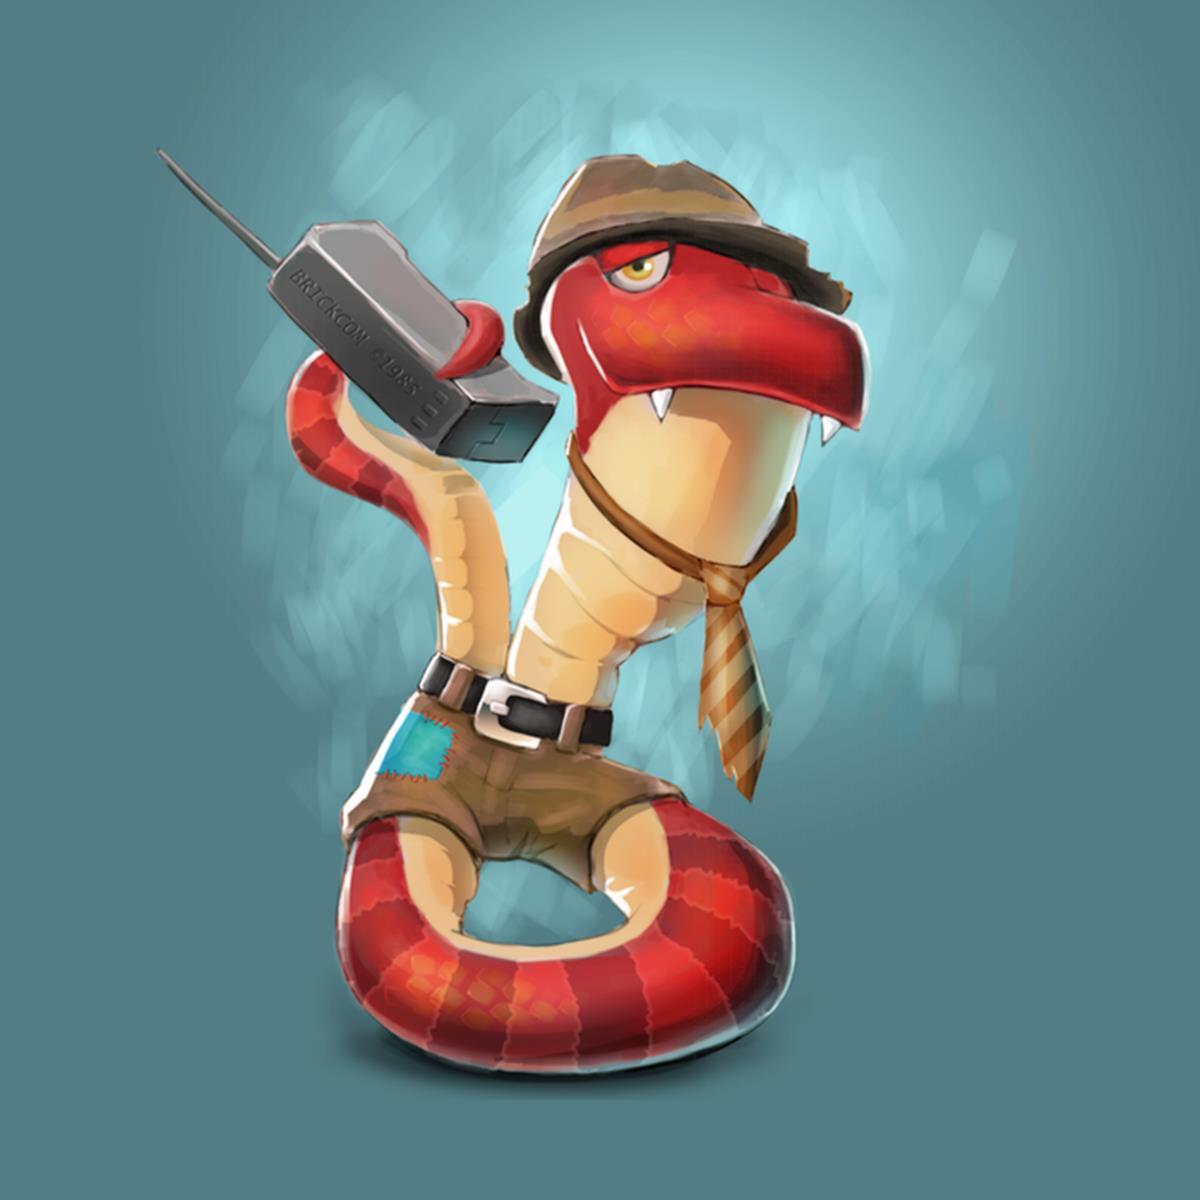 Hd Wallpaper Cartoon Girl Banjo Kazooie Successor Gets New Character That Is A Snake